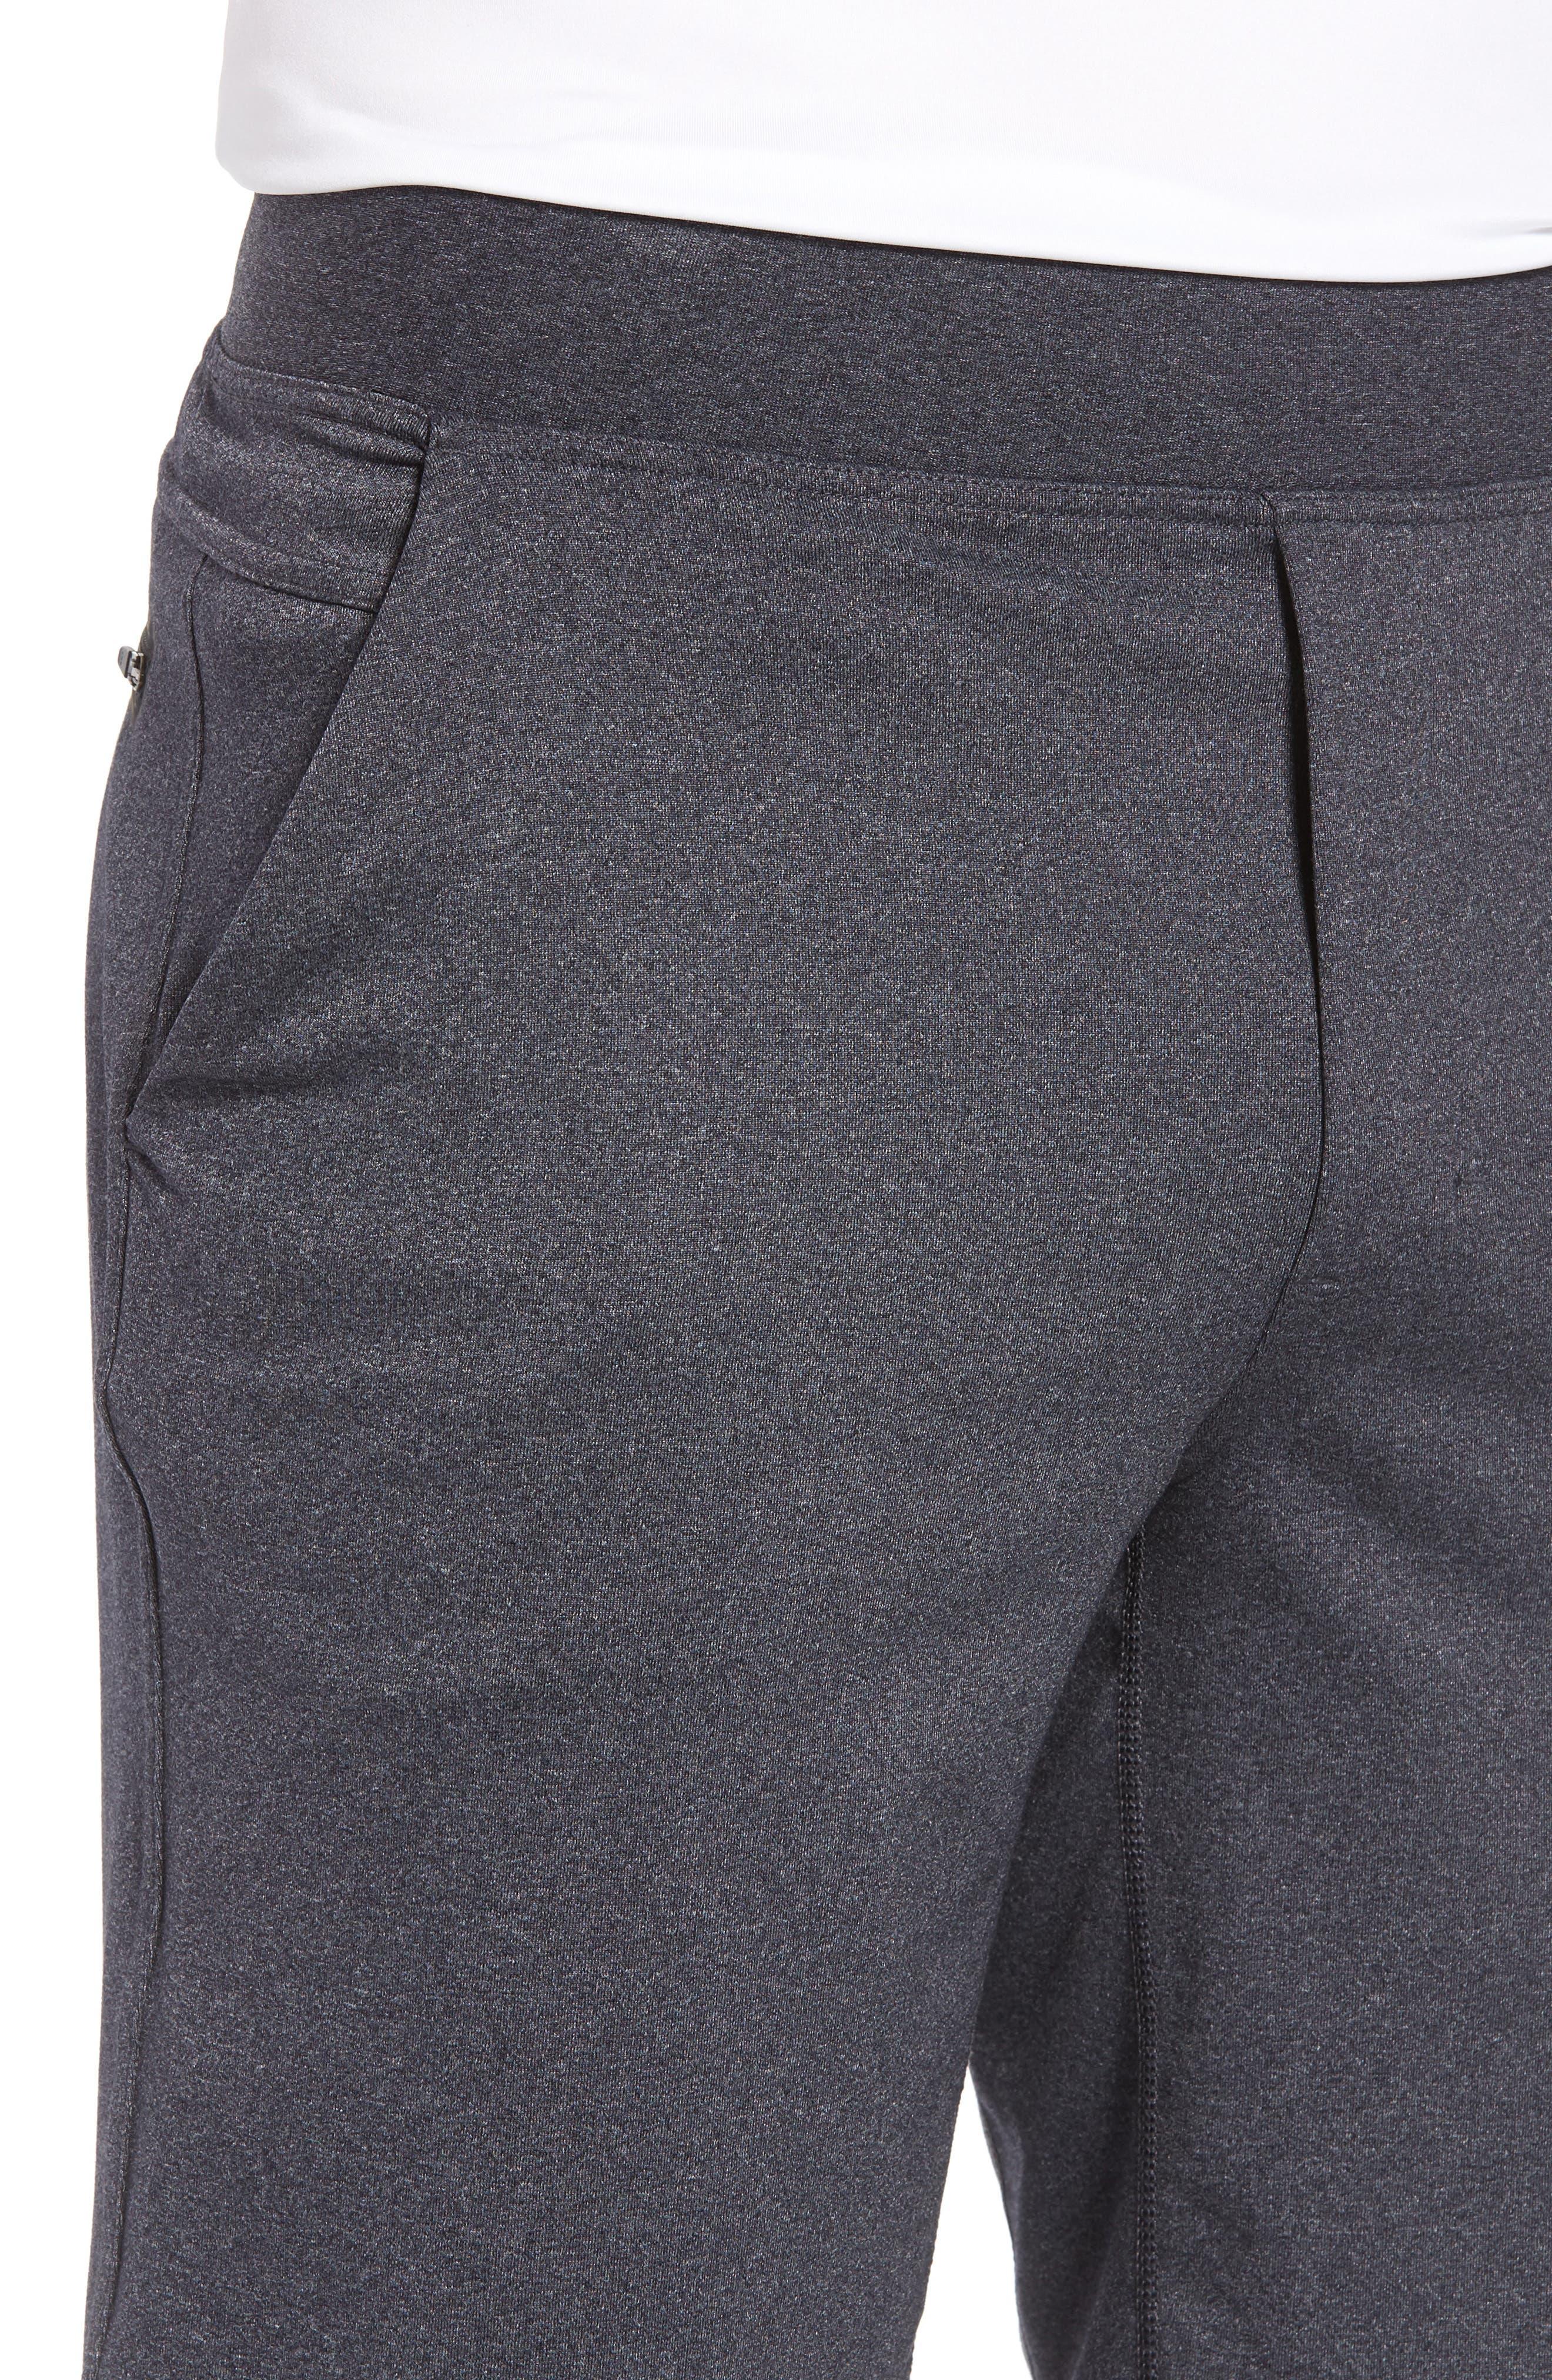 206 Shorts,                             Alternate thumbnail 4, color,                             Charcoal